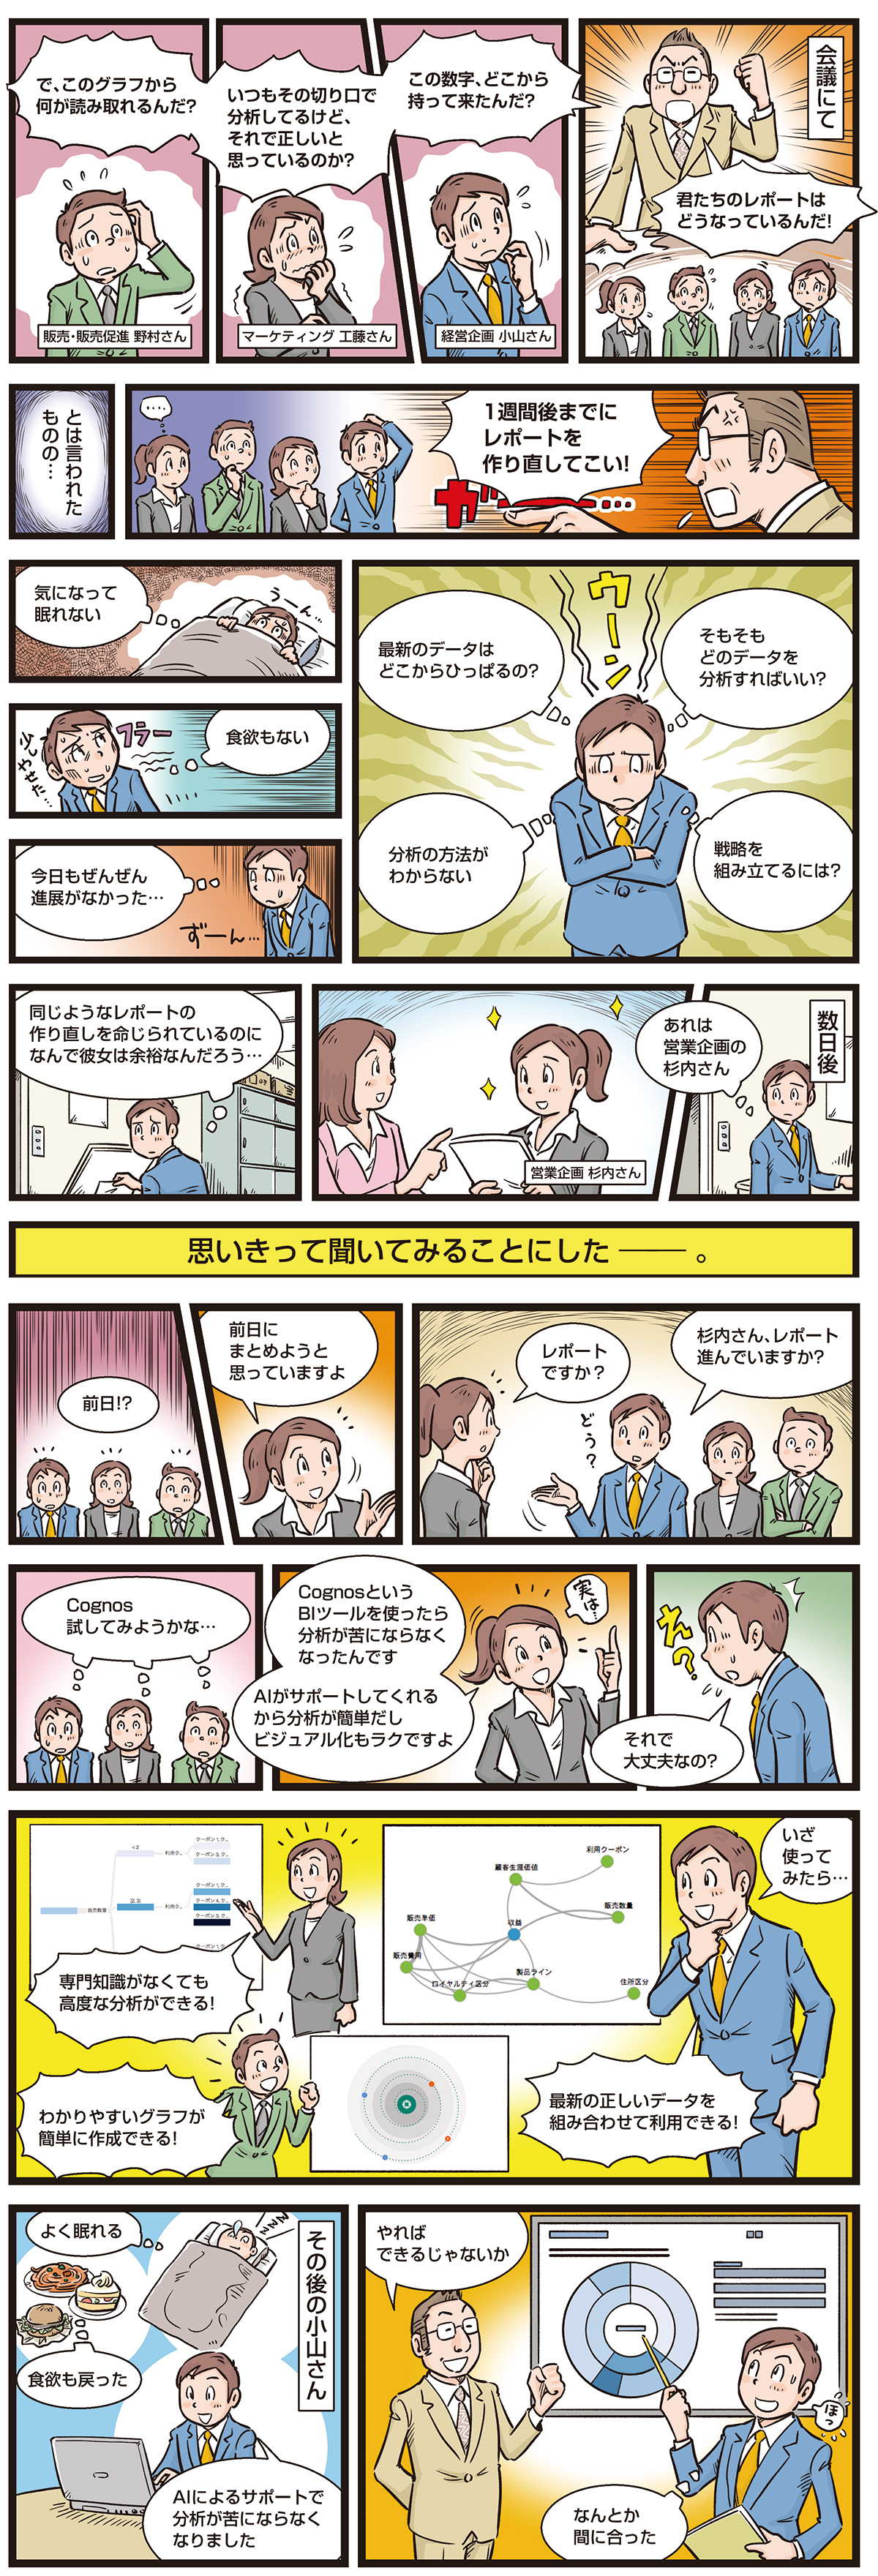 https://www.ibm.com/blogs/think/jp-ja/wp-content/uploads/sites/21/2019/05/manga-cog-all0.jpg